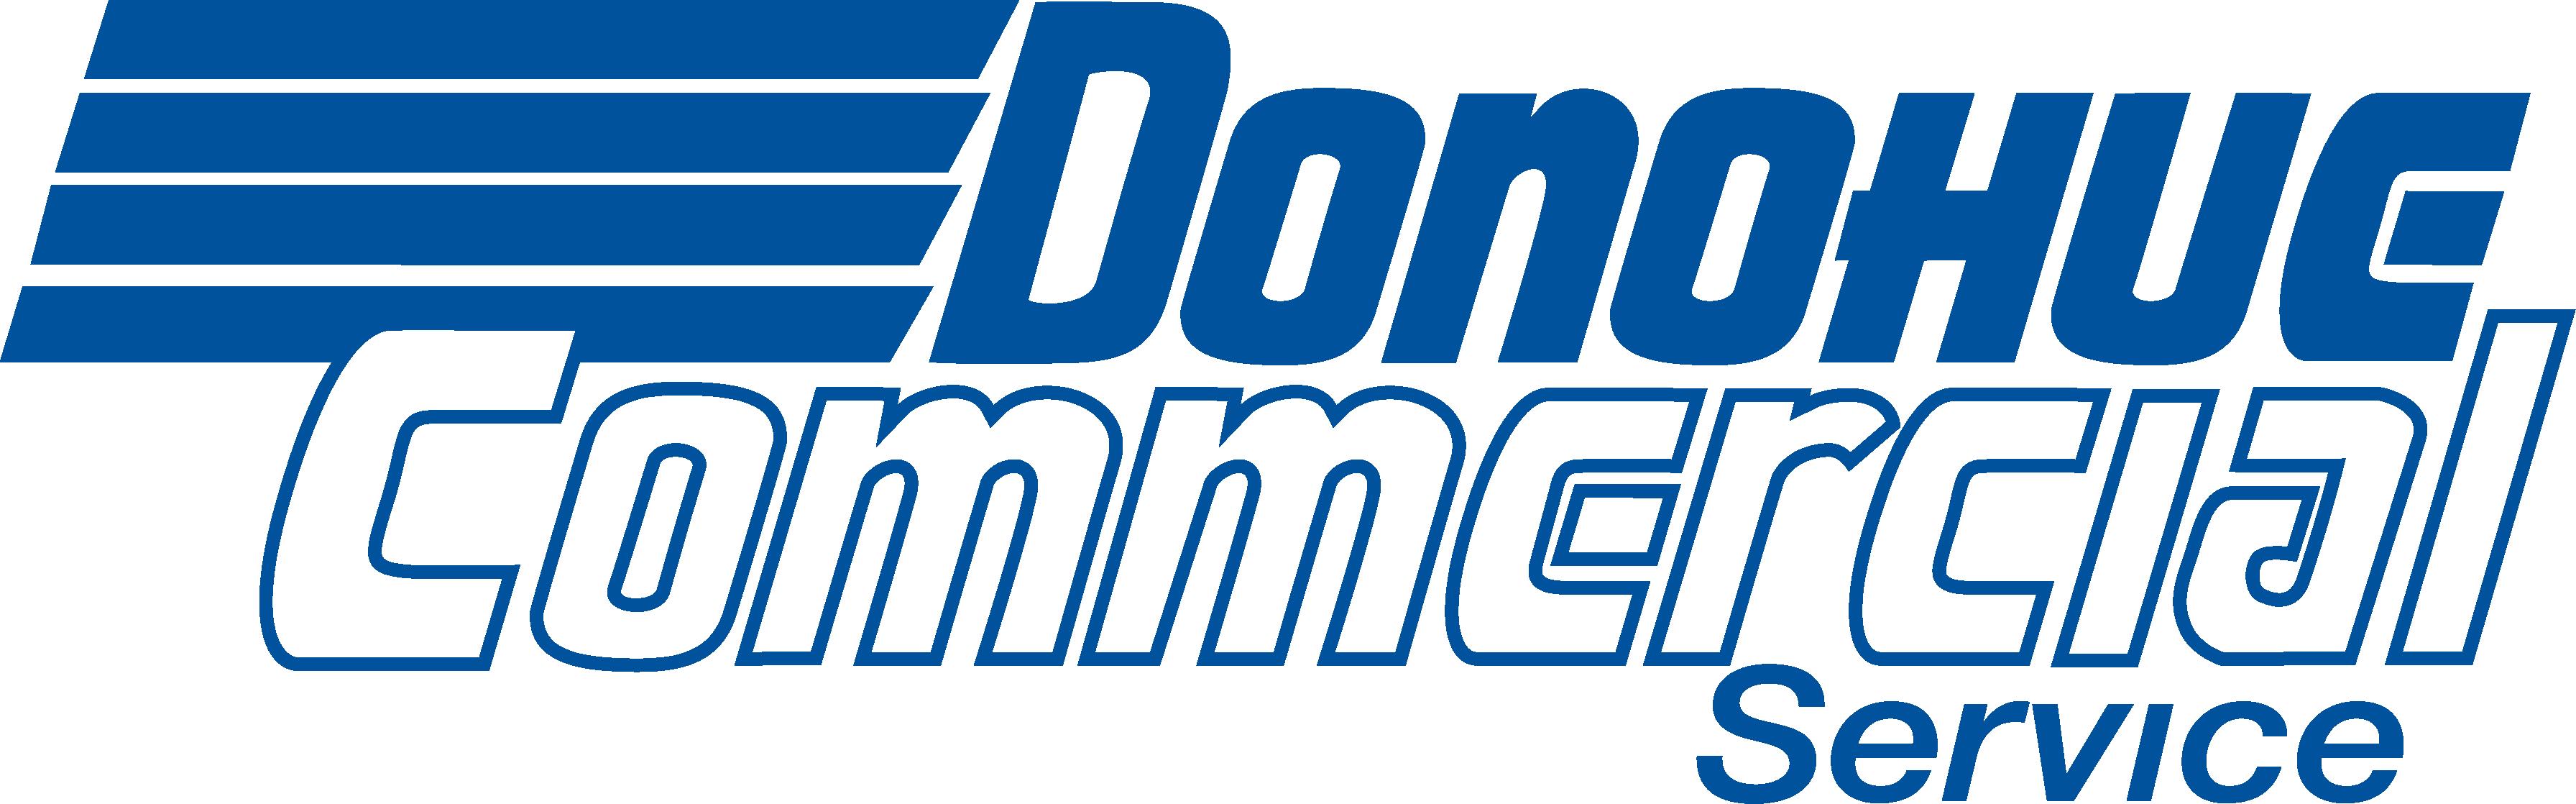 Donohue-VAN